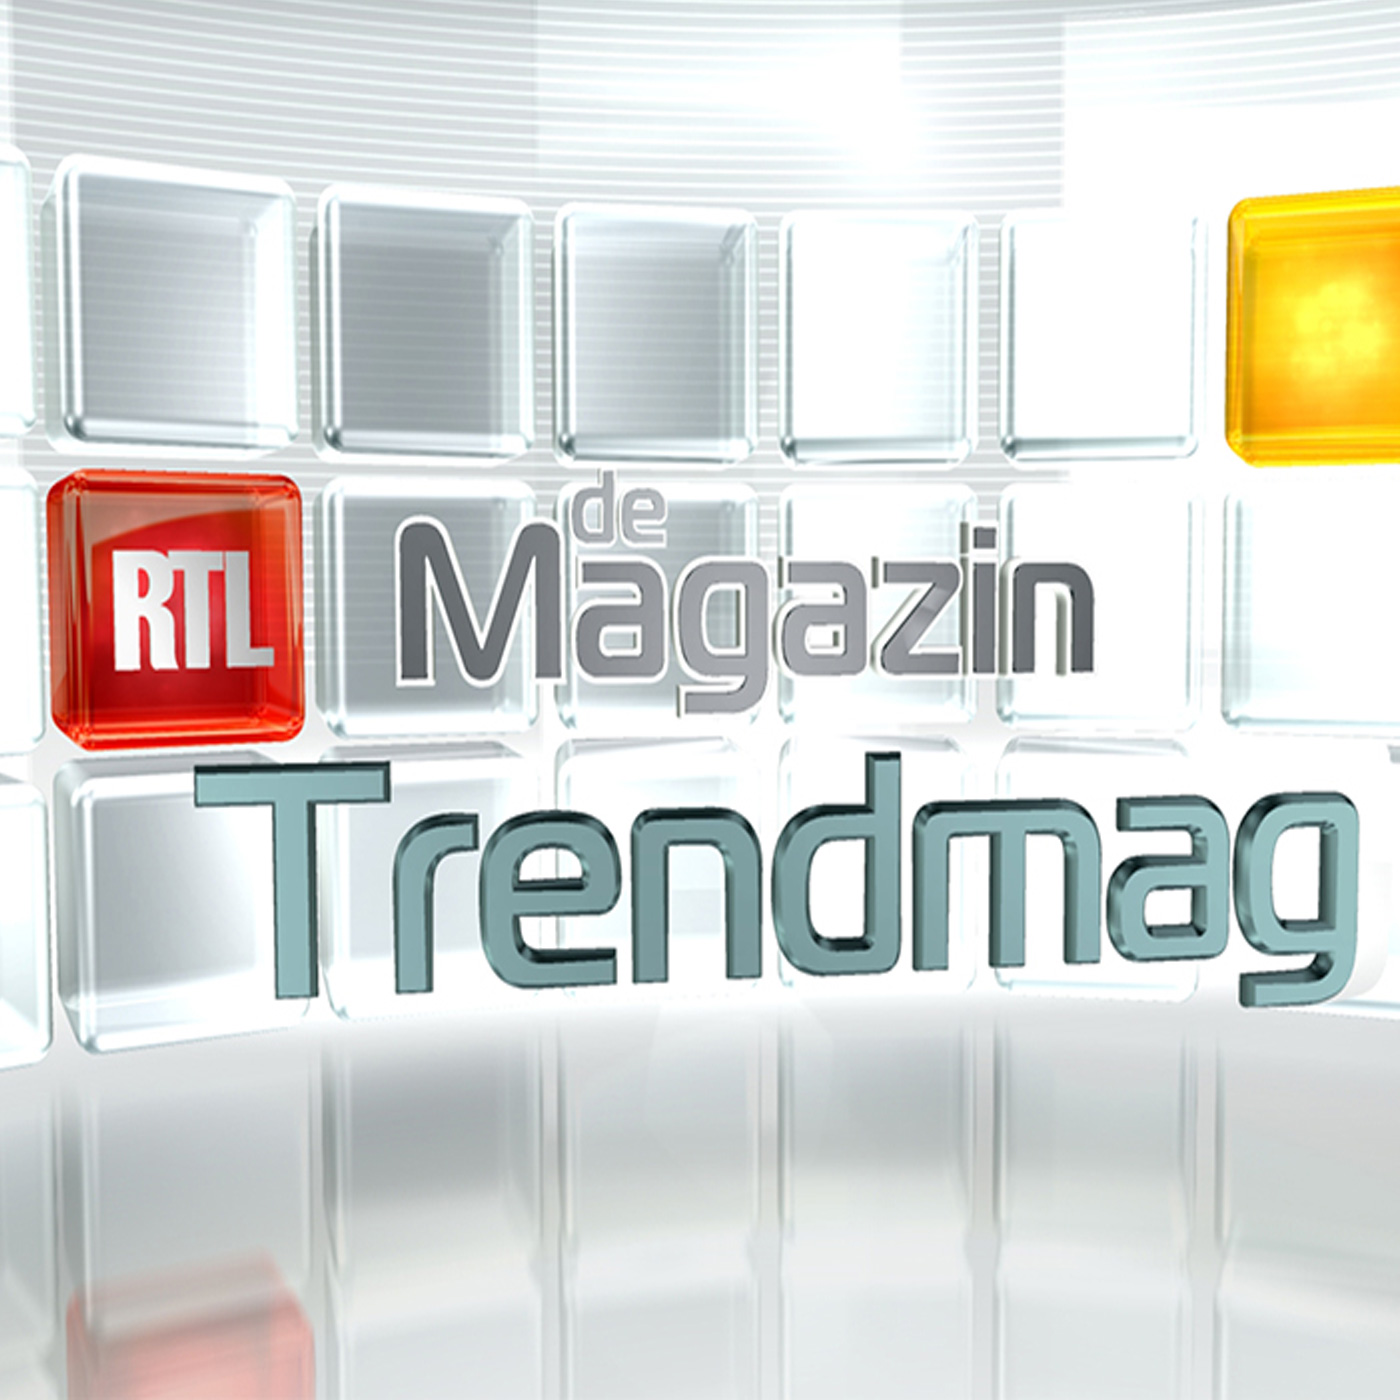 RTL - Trendmag (Small)